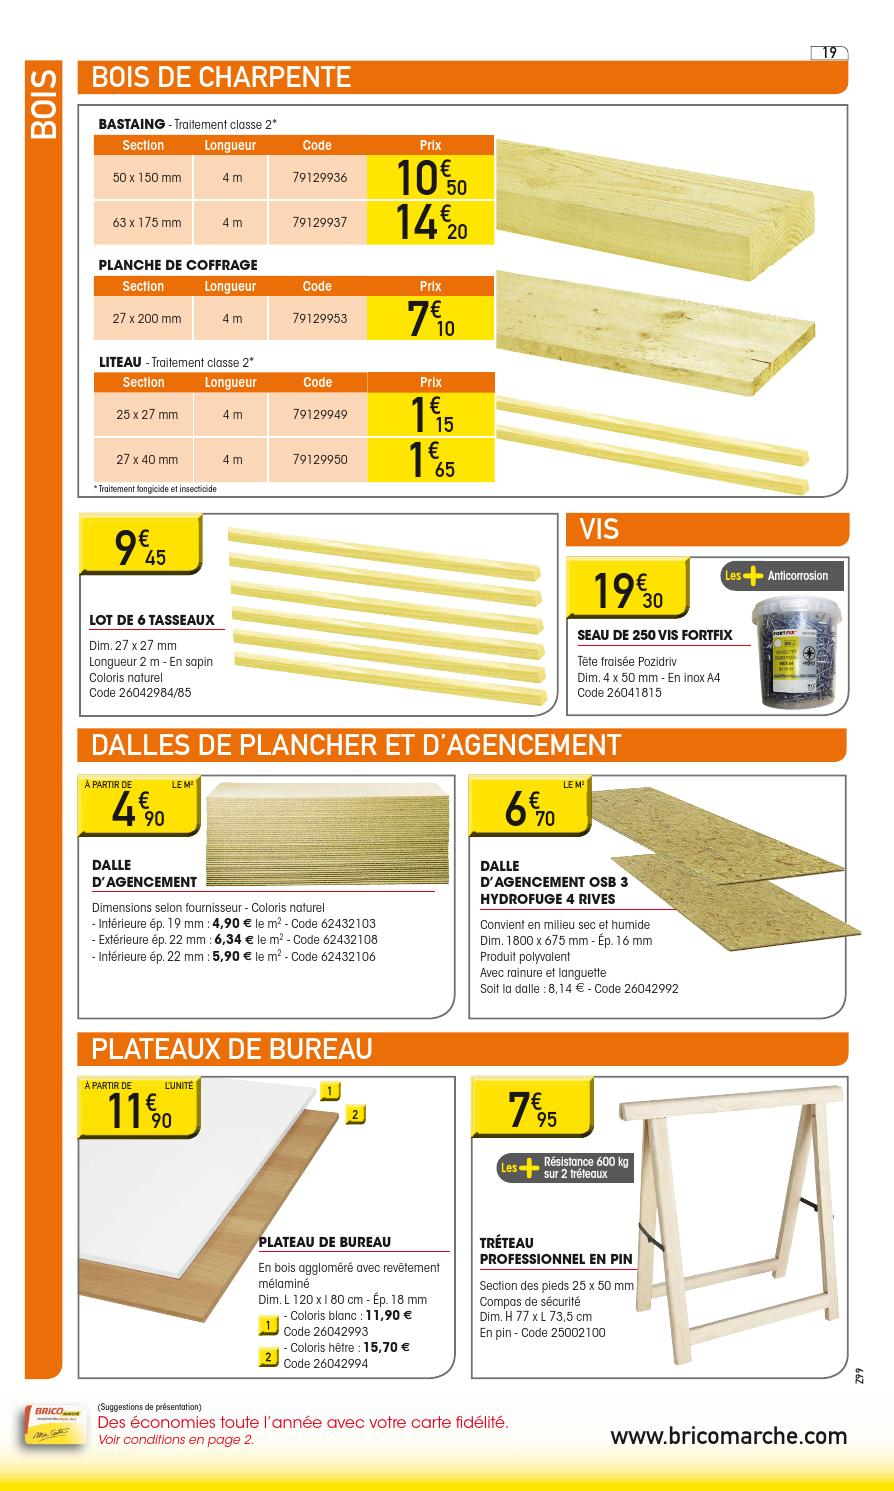 Catalogue Bricomarché Valable Jusquau 29092013 By Joe